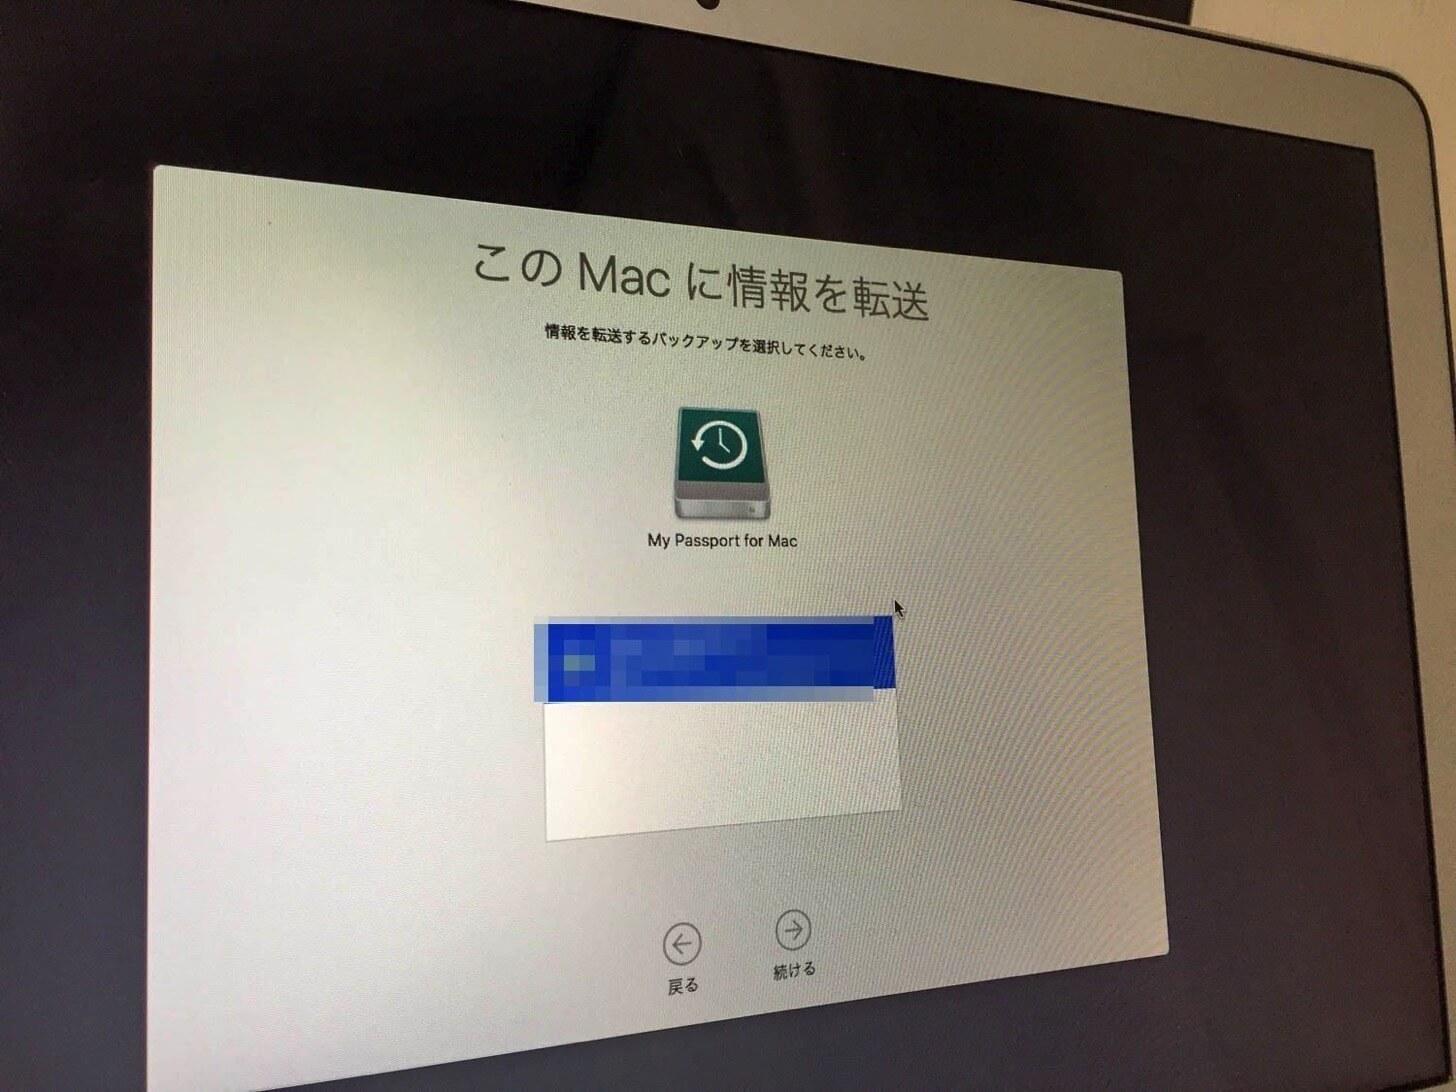 mac-timemachine-backup-restoration6